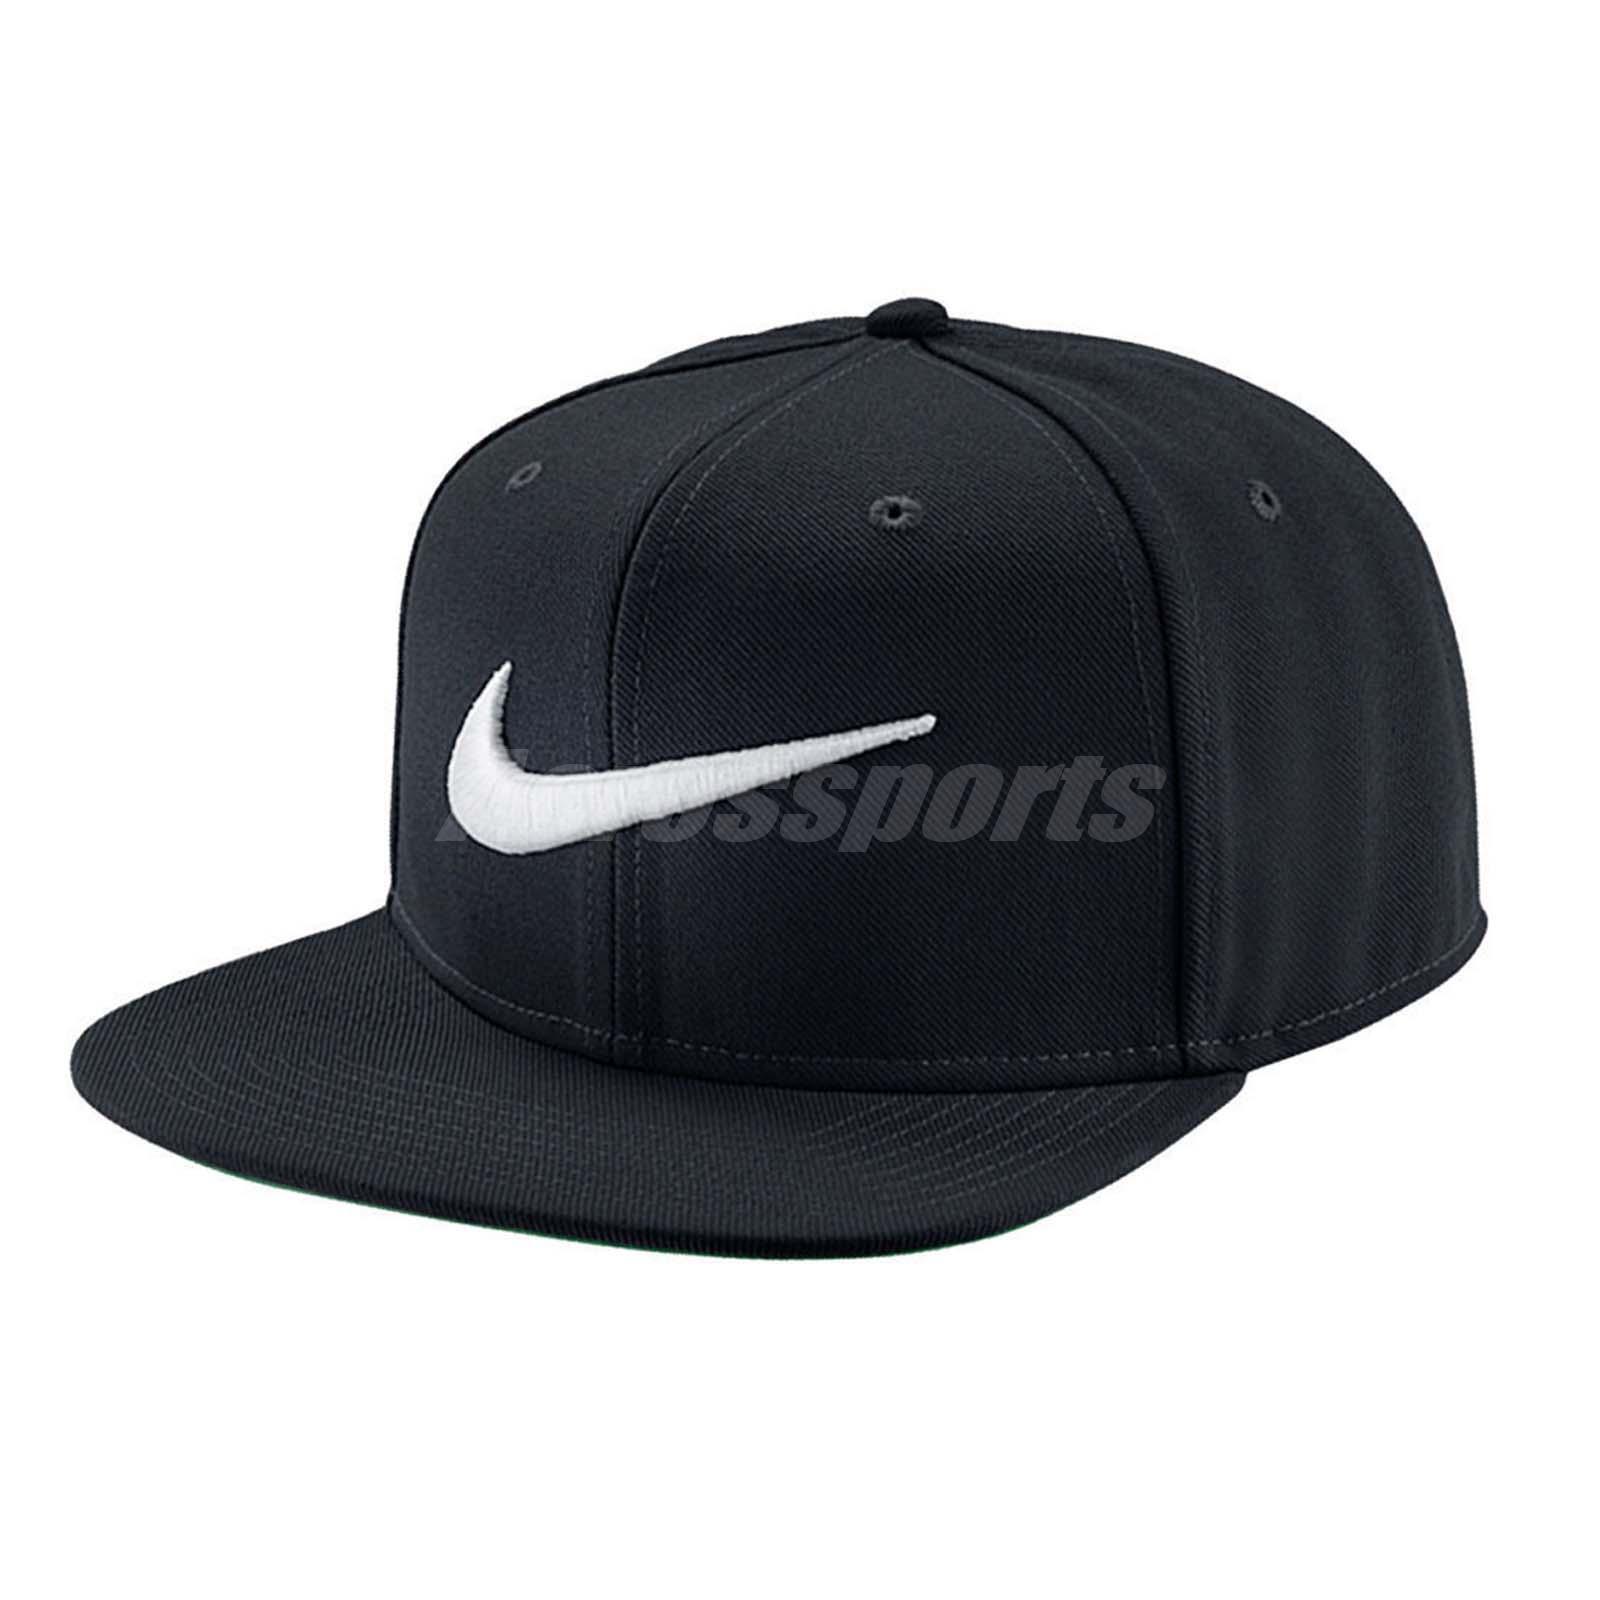 Nike Swoosh Pro Snapback Hat 639534-011 Black Green White Mens One ... f33de4b54fc